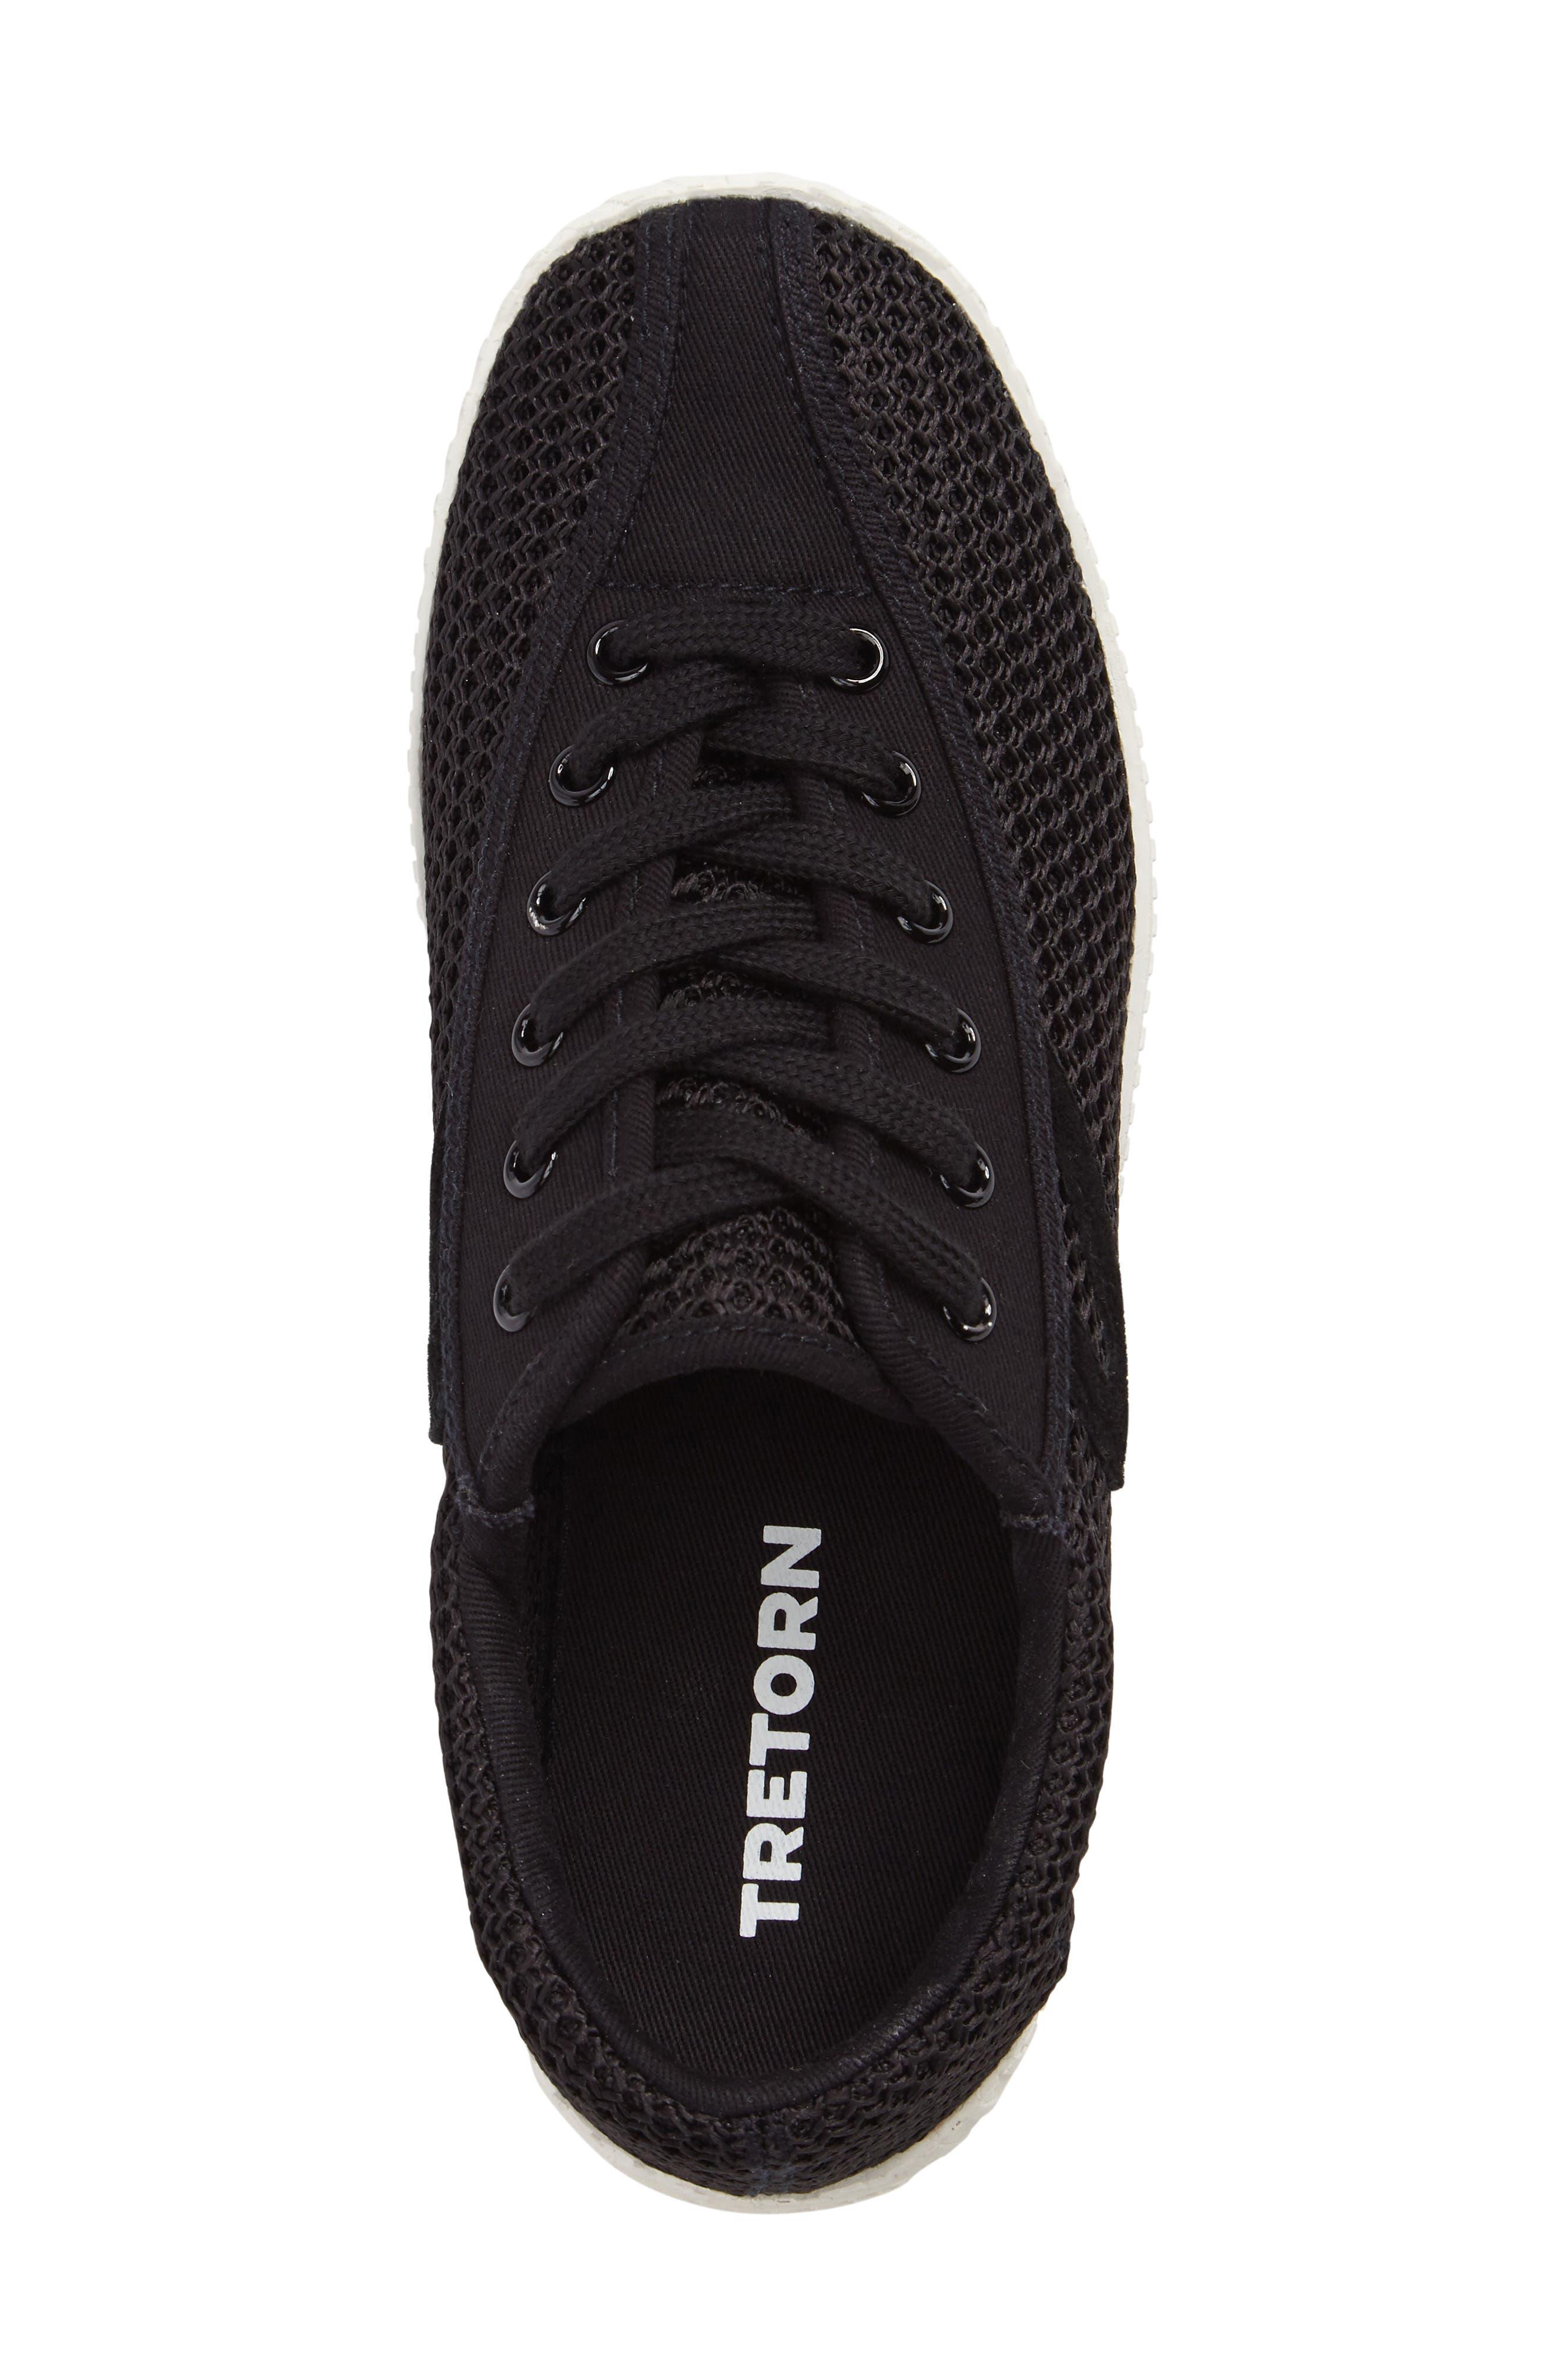 Nylite Sneaker,                             Alternate thumbnail 5, color,                             001